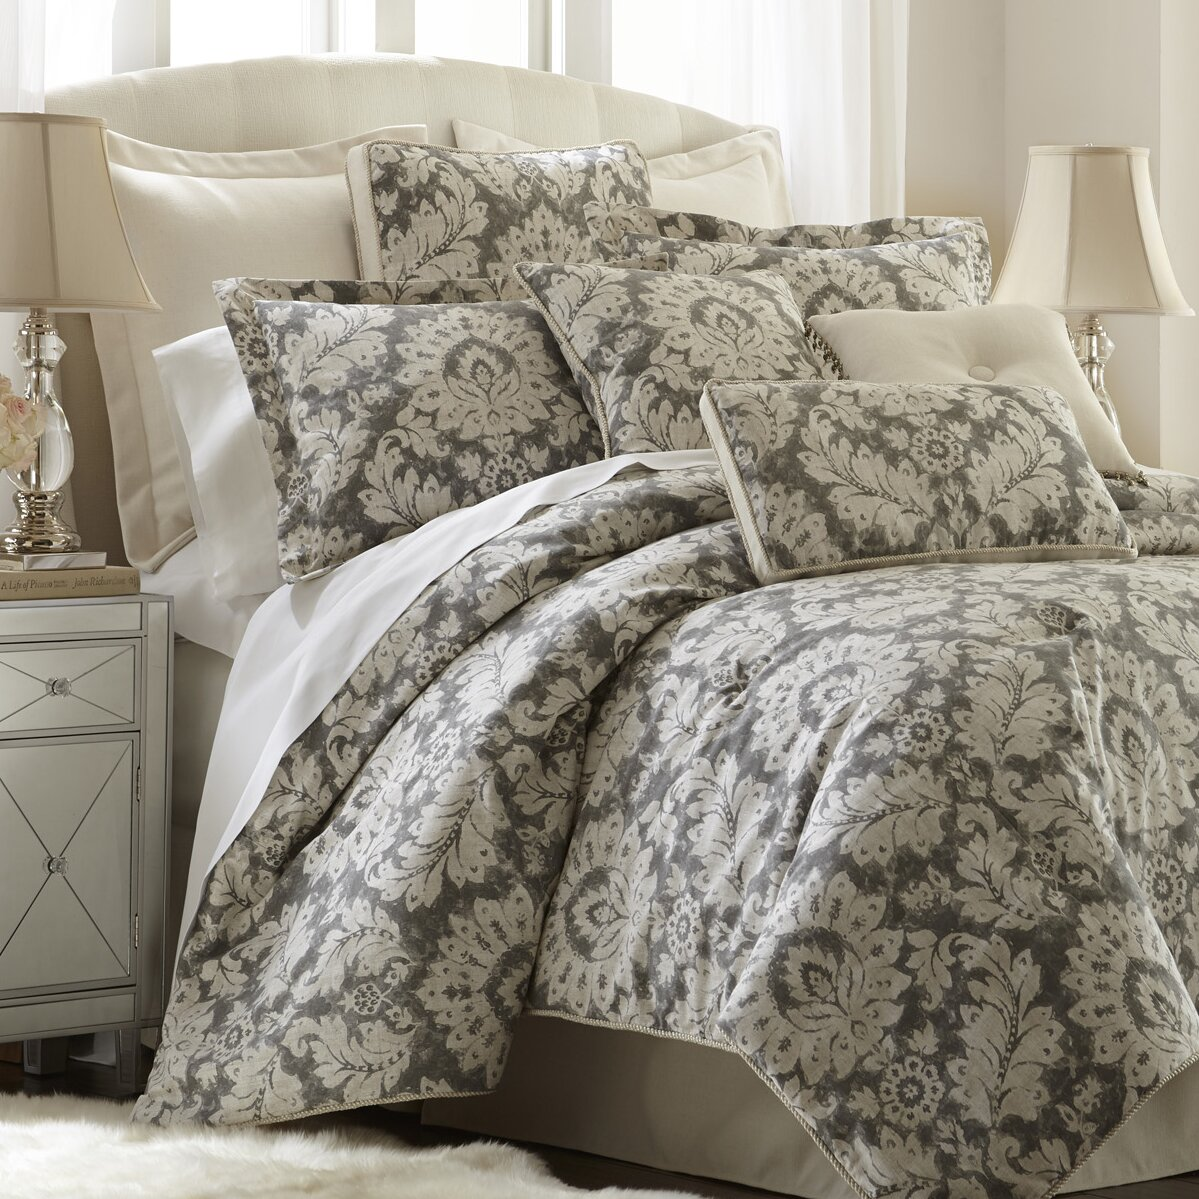 Sherry kline brooklyn 4 piece comforter set wayfair for Brooklyn bedding sale